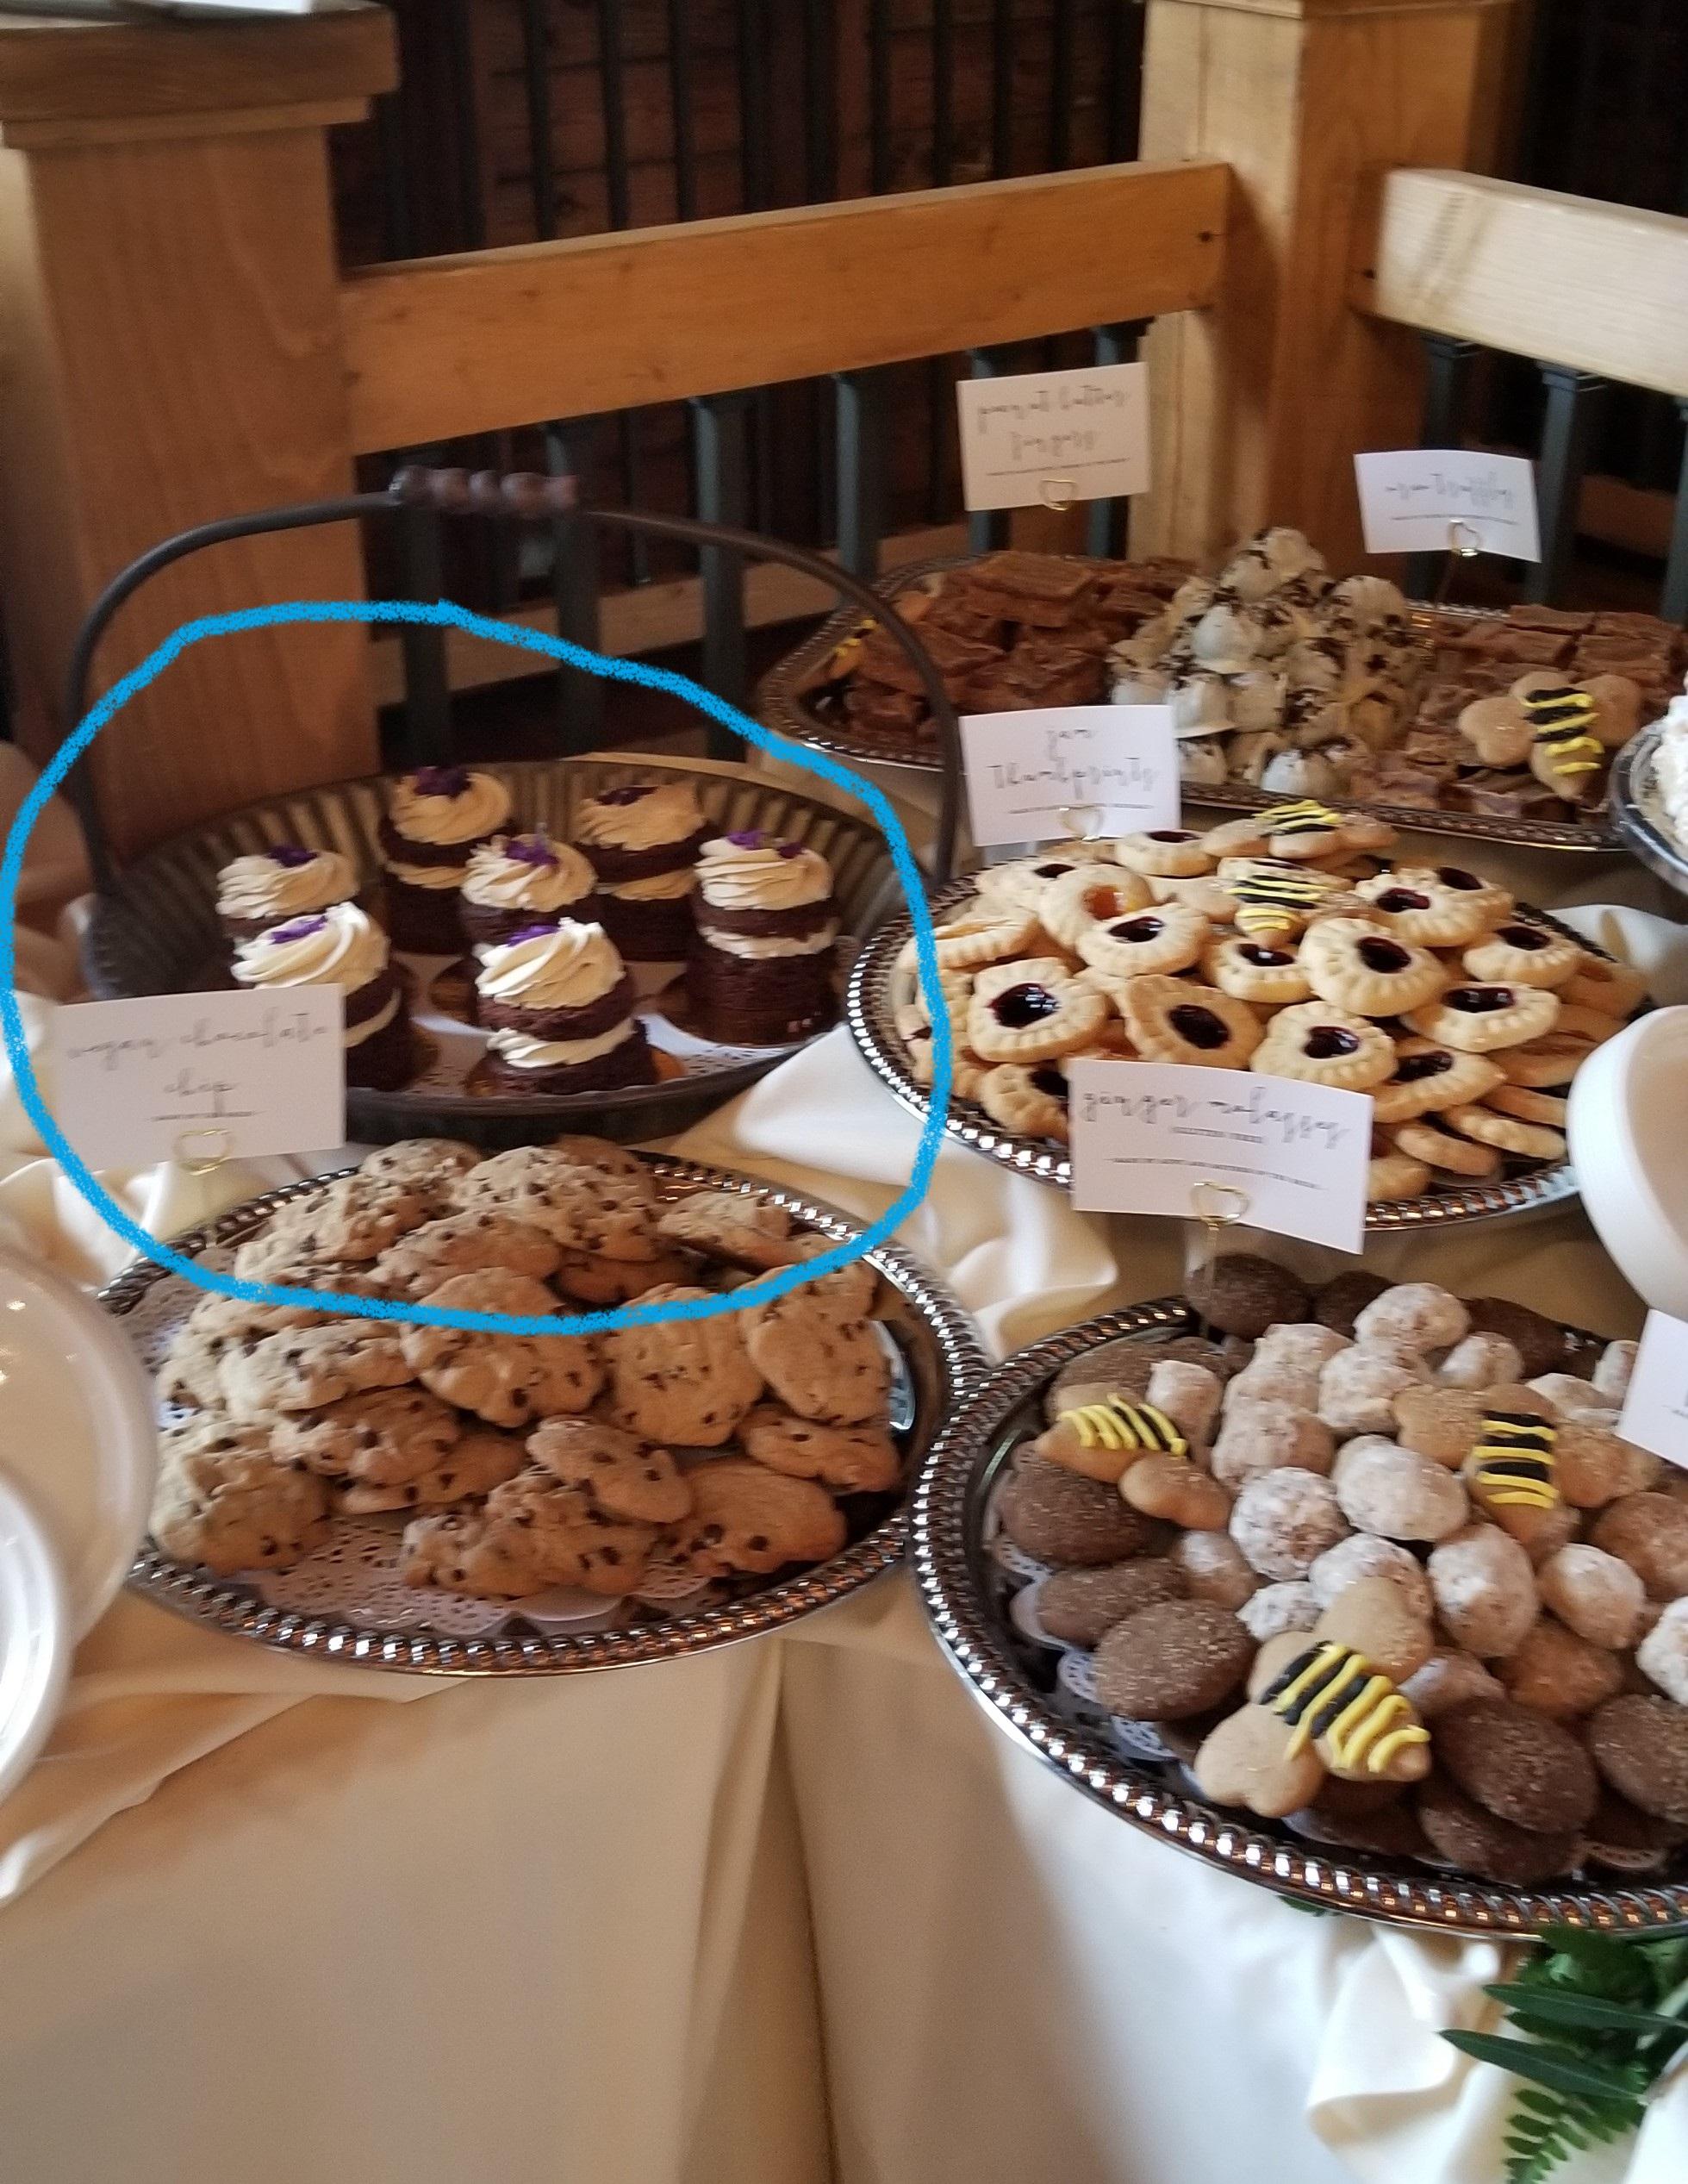 Vegan Chocolate Peanut Butter Cupcakes from Pittsburgh bakery, Butterwood Bake Consortium.